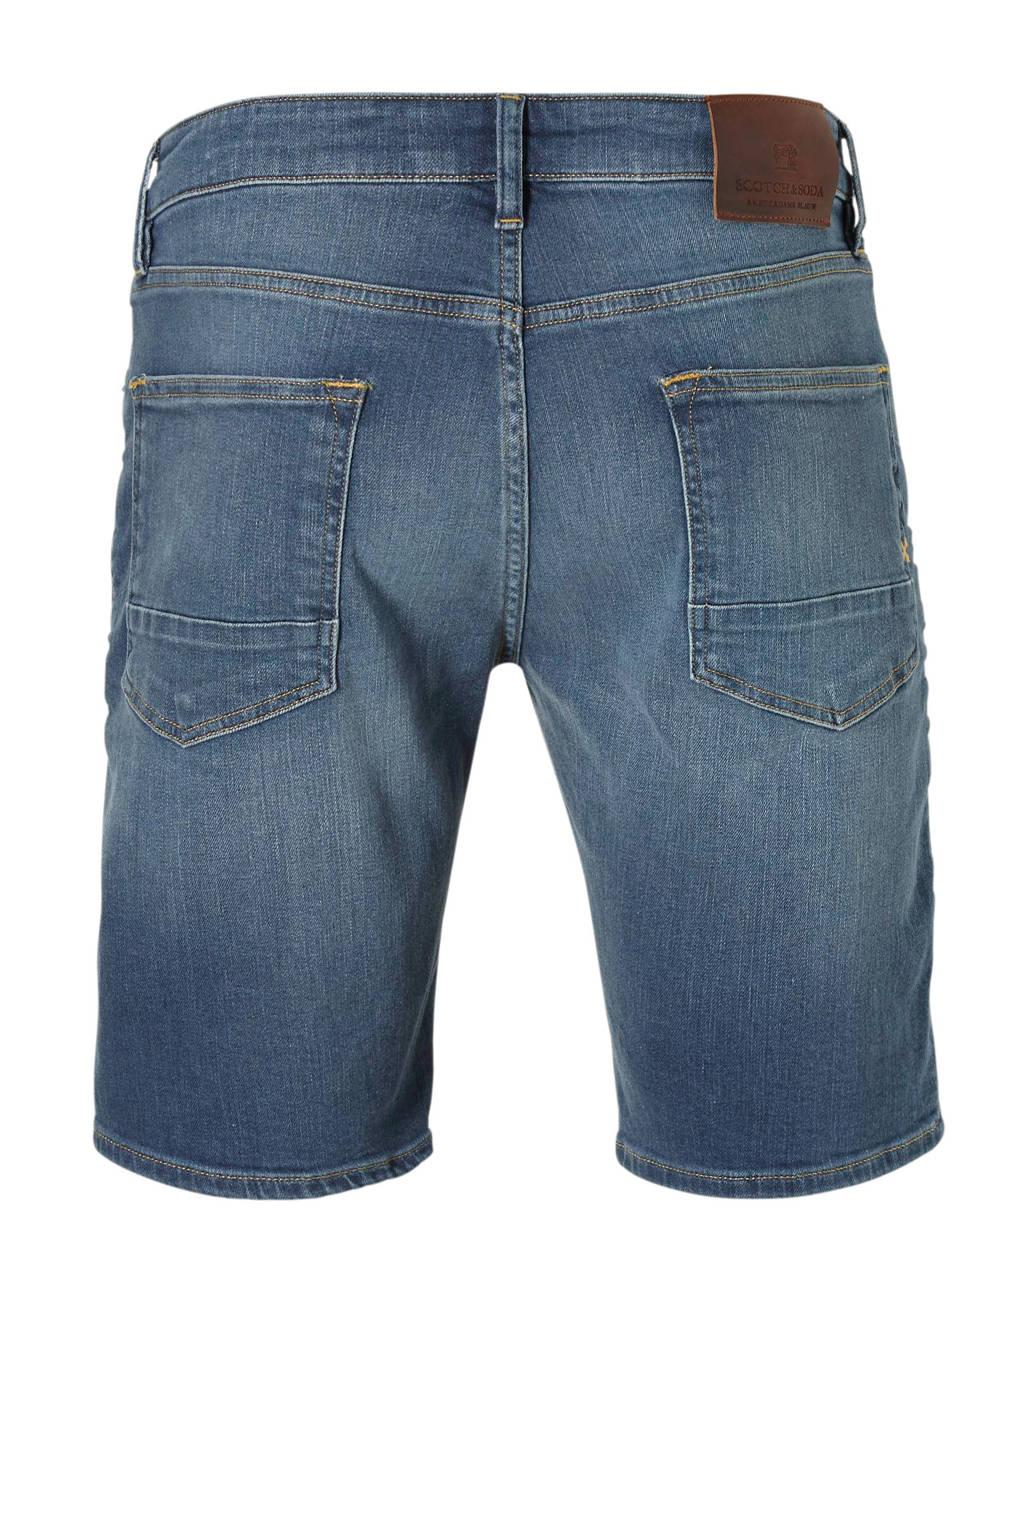 Scotch & Soda slim fit jeans short Ralston, Blauw